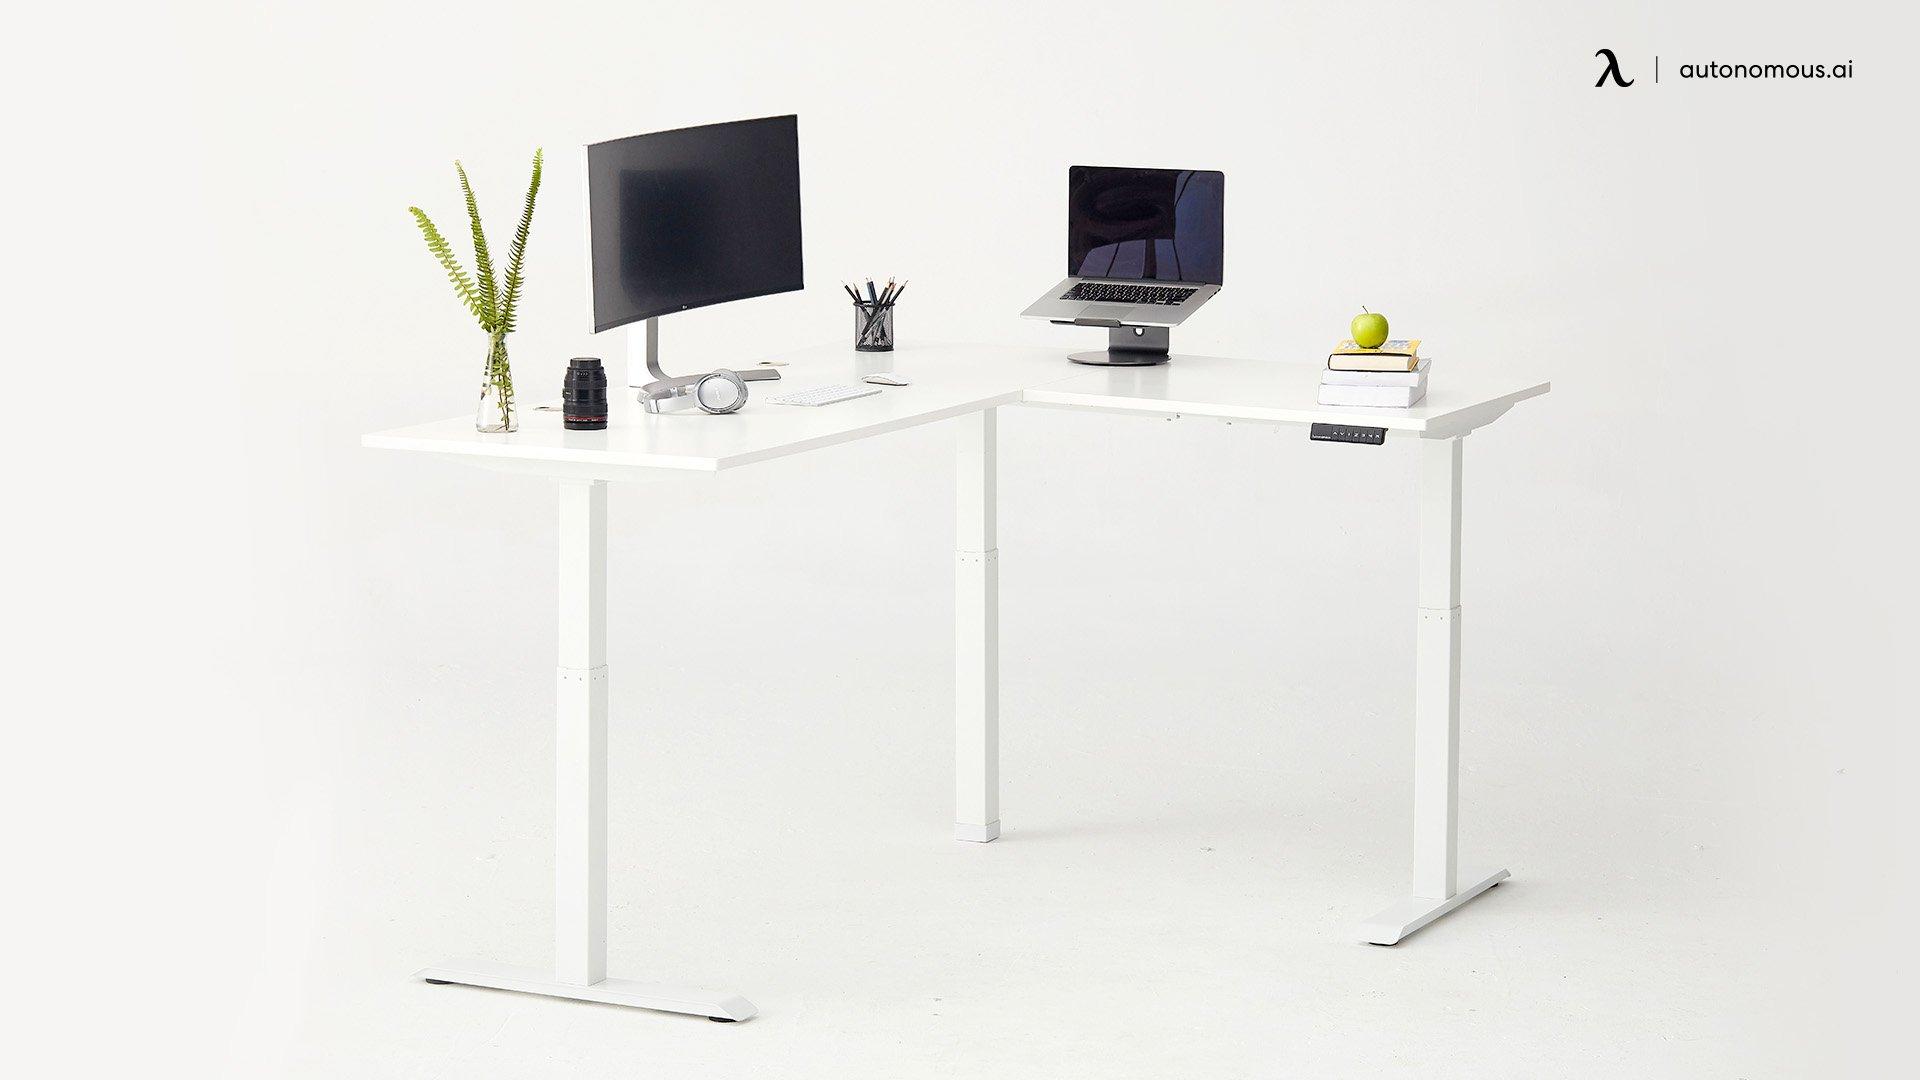 A DIY Adjustable corner desk idea